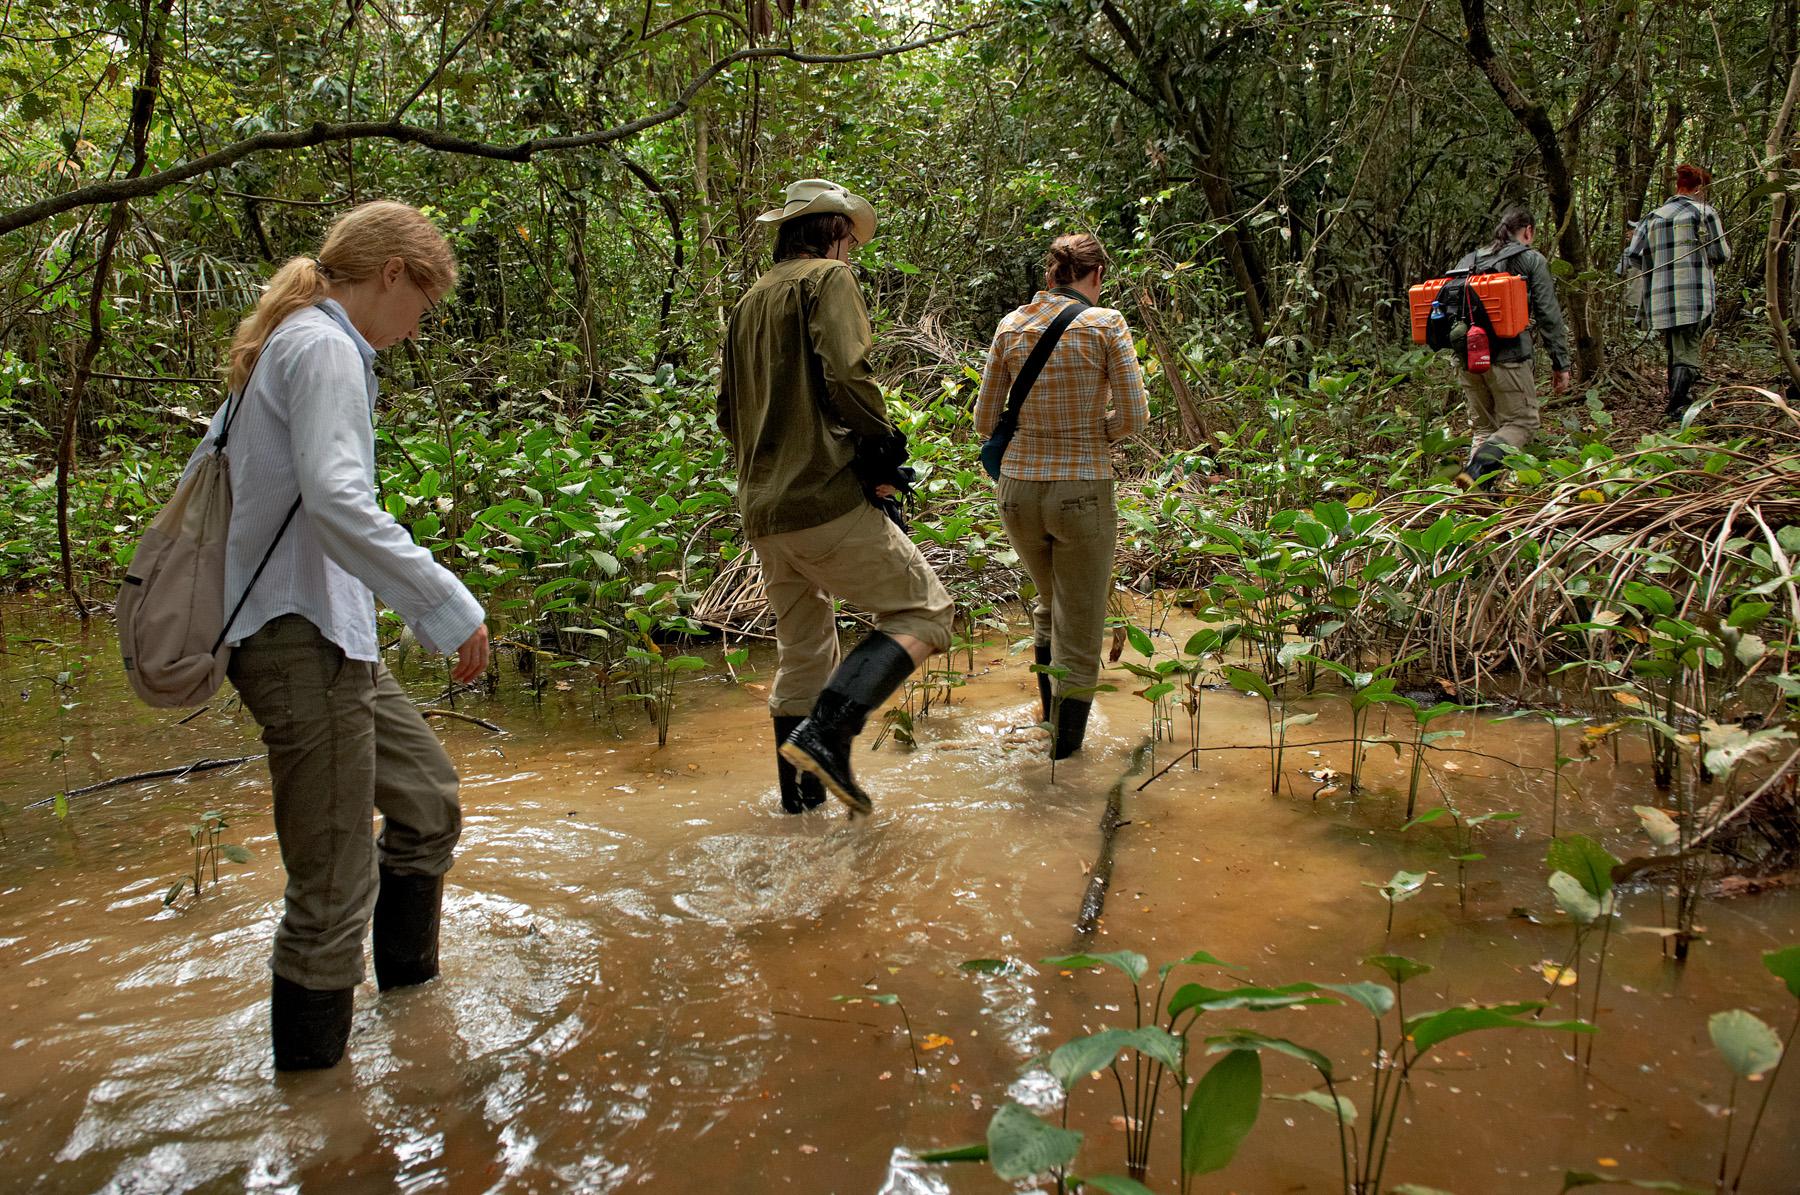 Džunglimatkal Kolumbia Amazonases 2011. a. Foto: Kaupo Kikkas